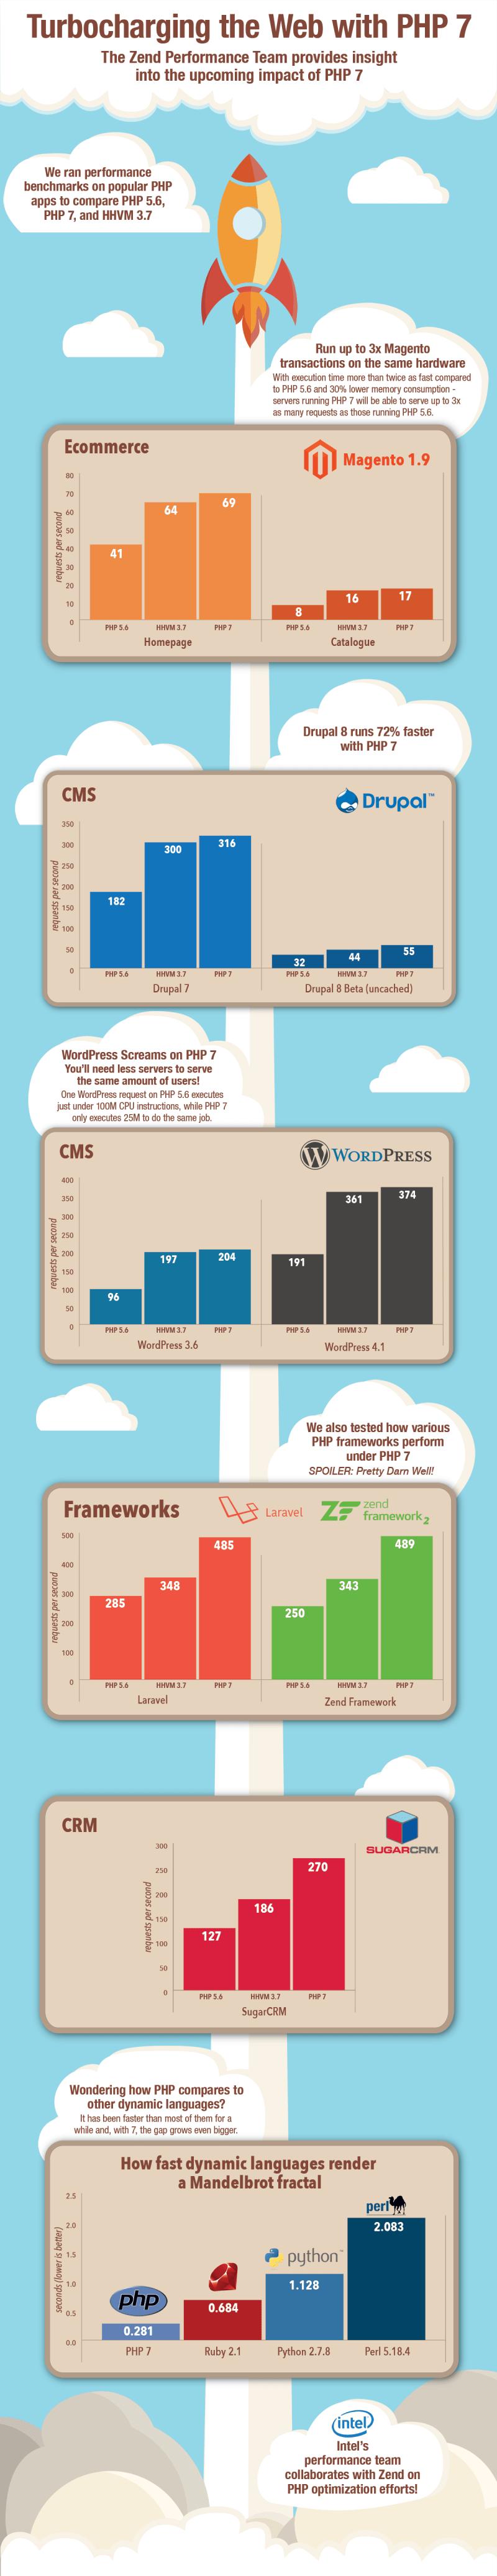 Acelera tu web con php 7